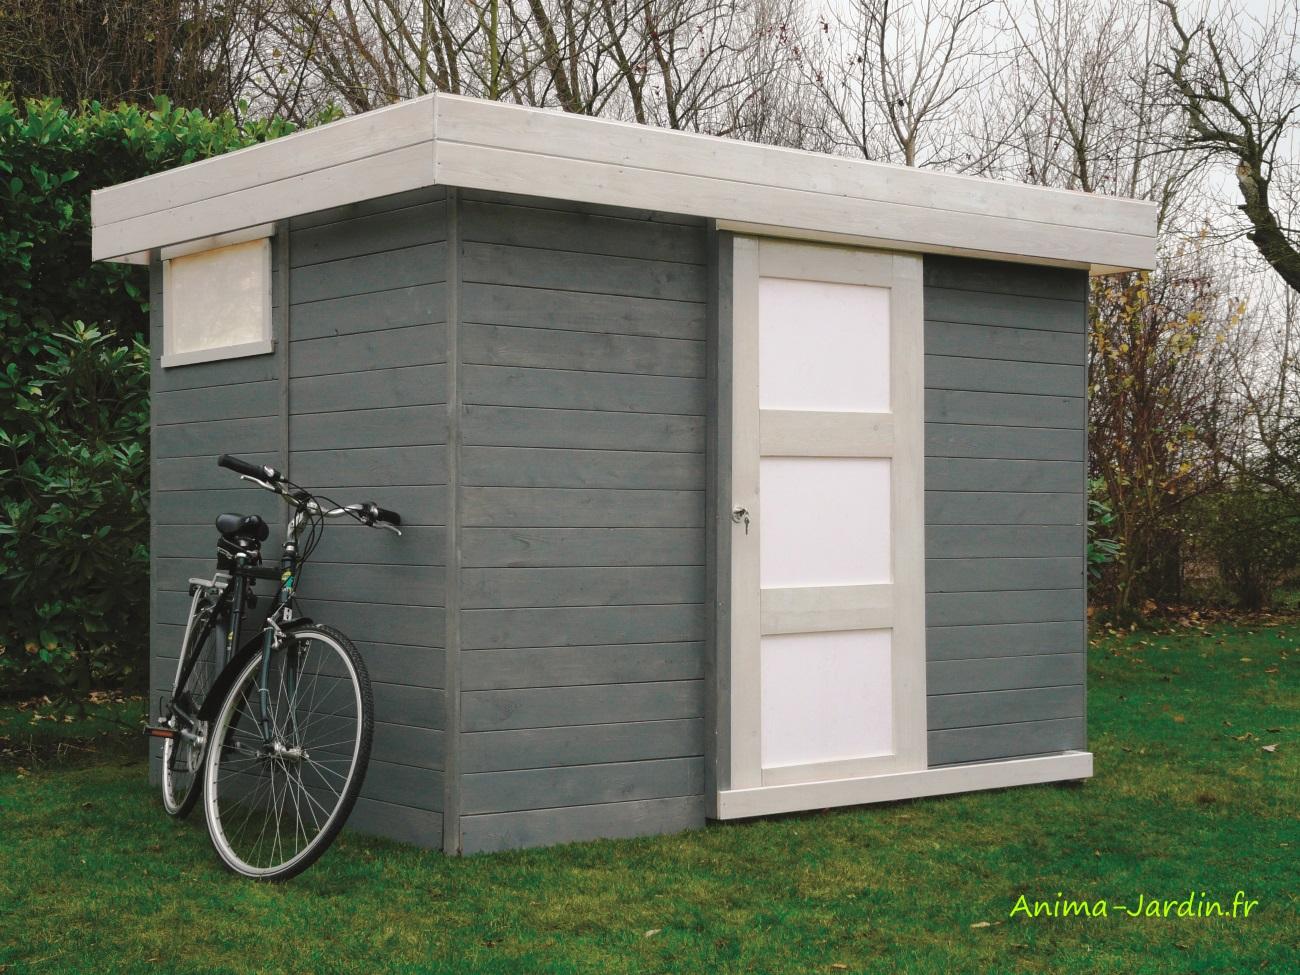 Abri-jardin-bois-Lund-chalet-cabanne-19mm-anima-jardin.fr